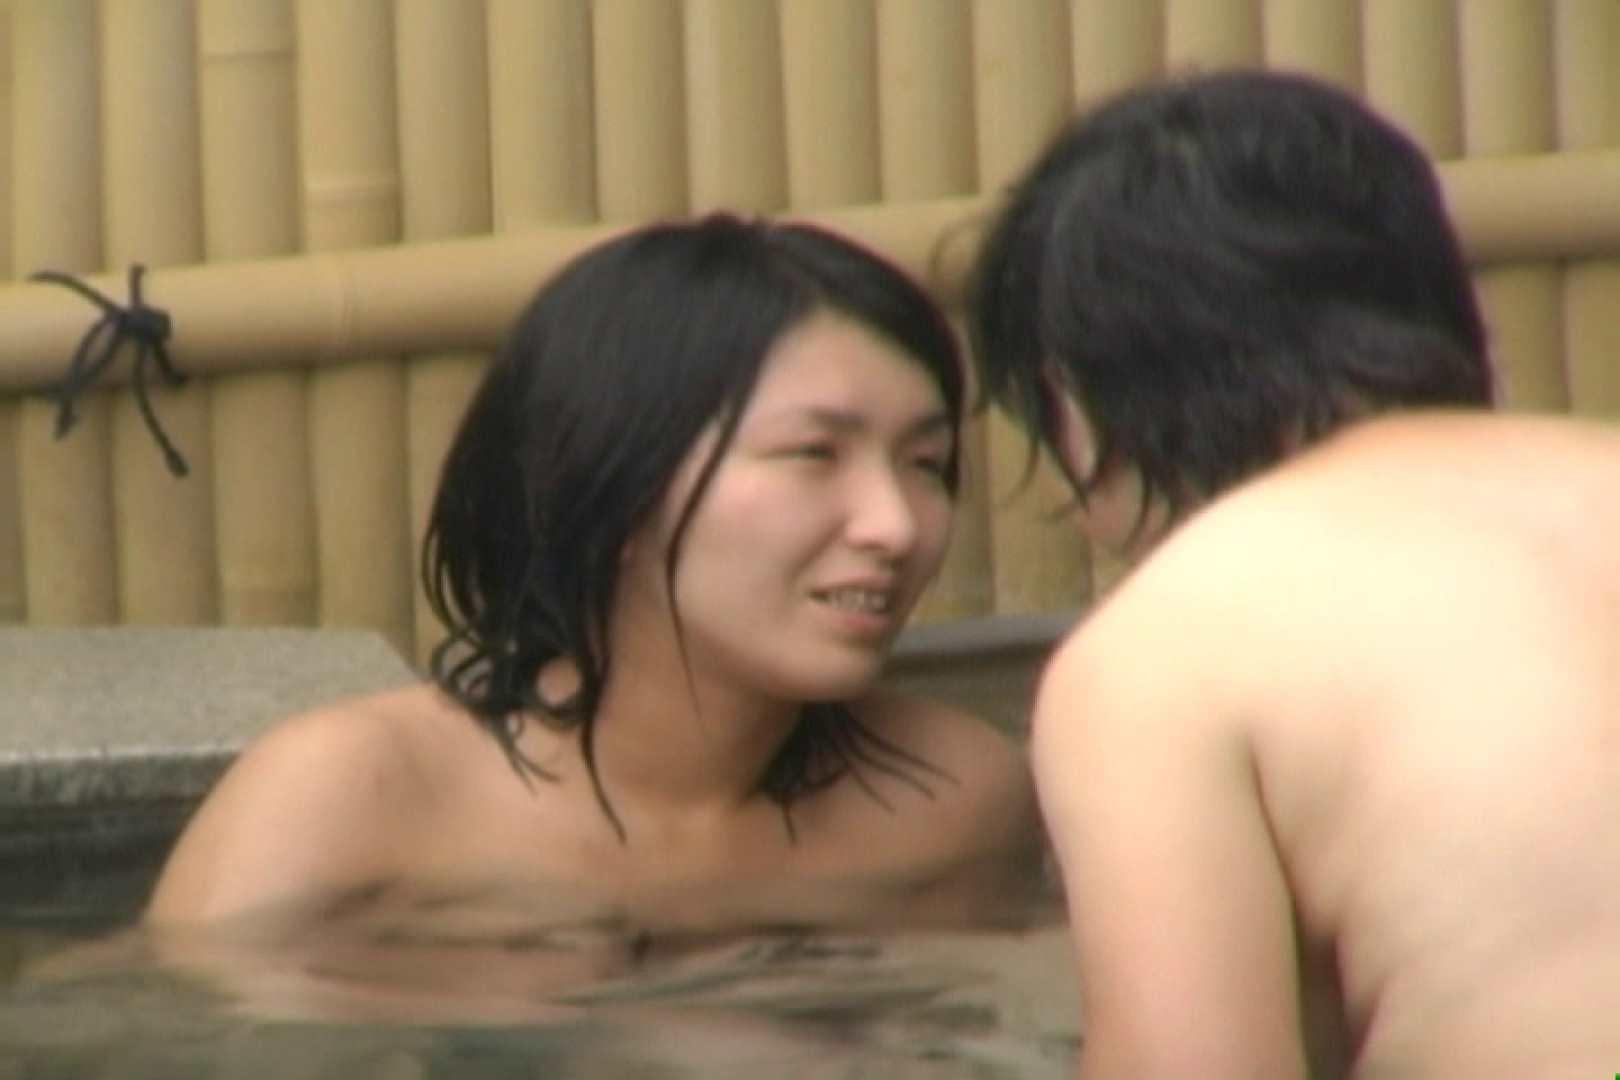 Aquaな露天風呂Vol.618 盗撮  67連発 60